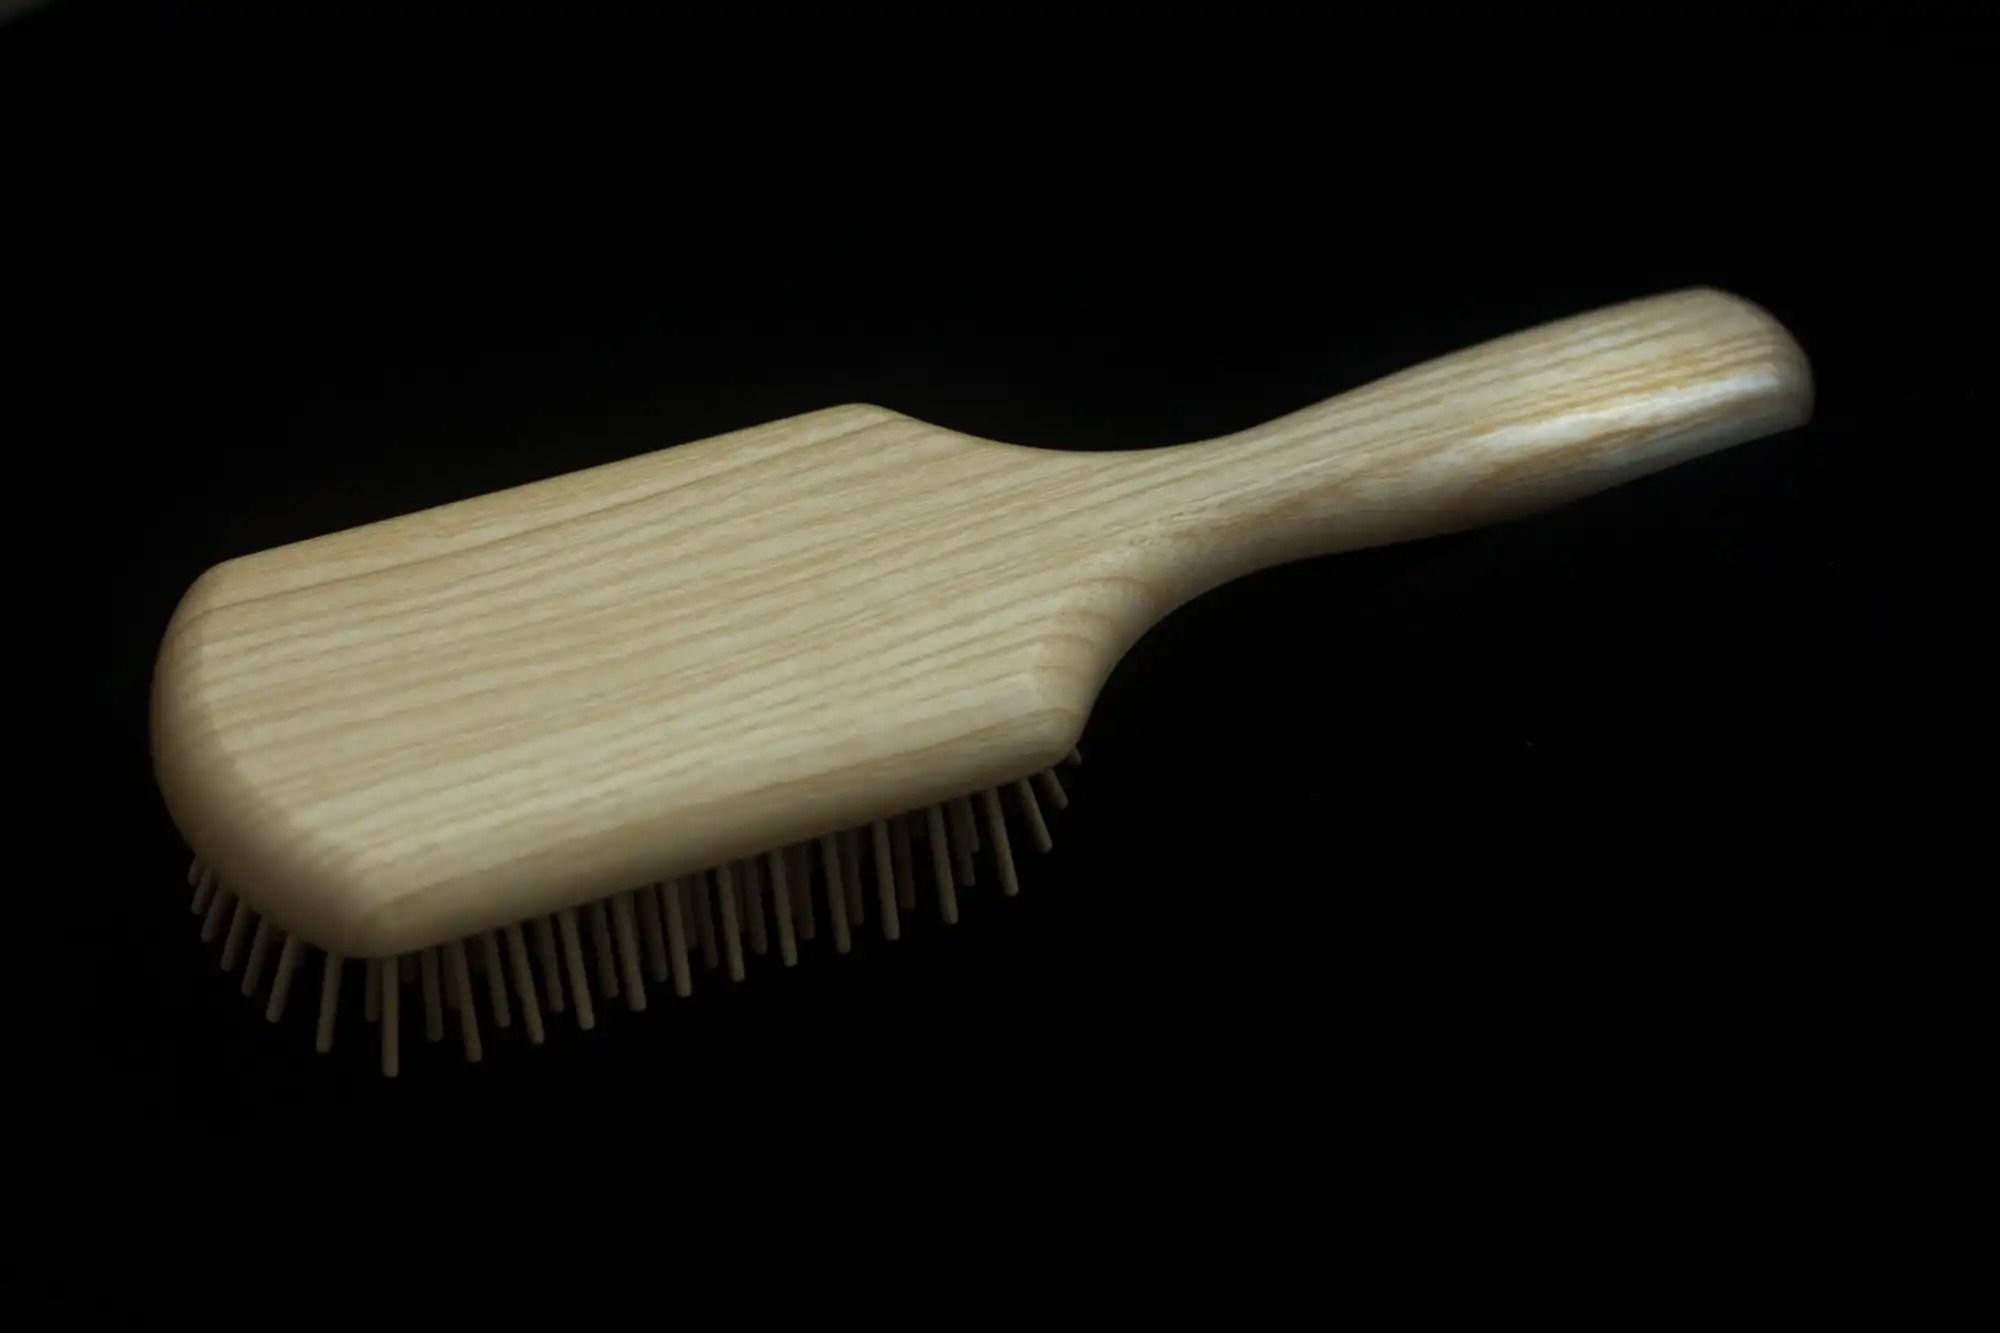 Widu Hair Brush on black background